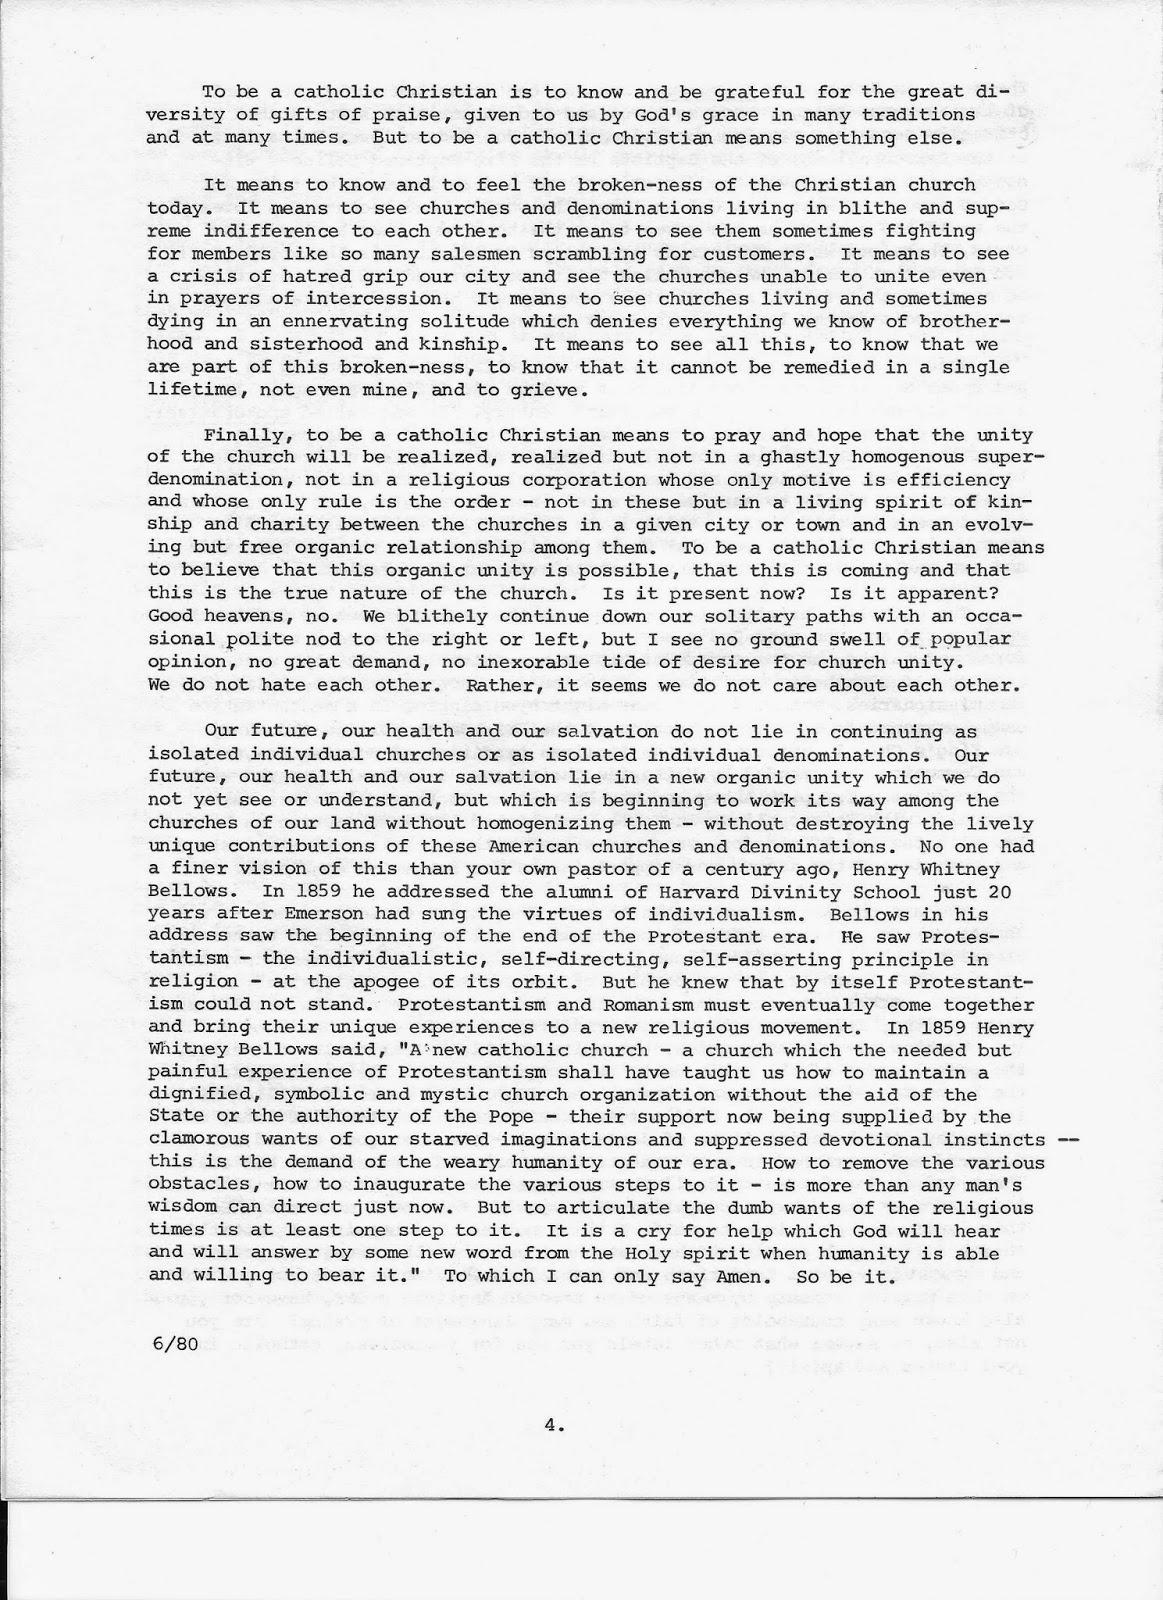 011 Manifest Destiny Essay Scovelcatholic4 Impressive Prompt Outline Introduction Full